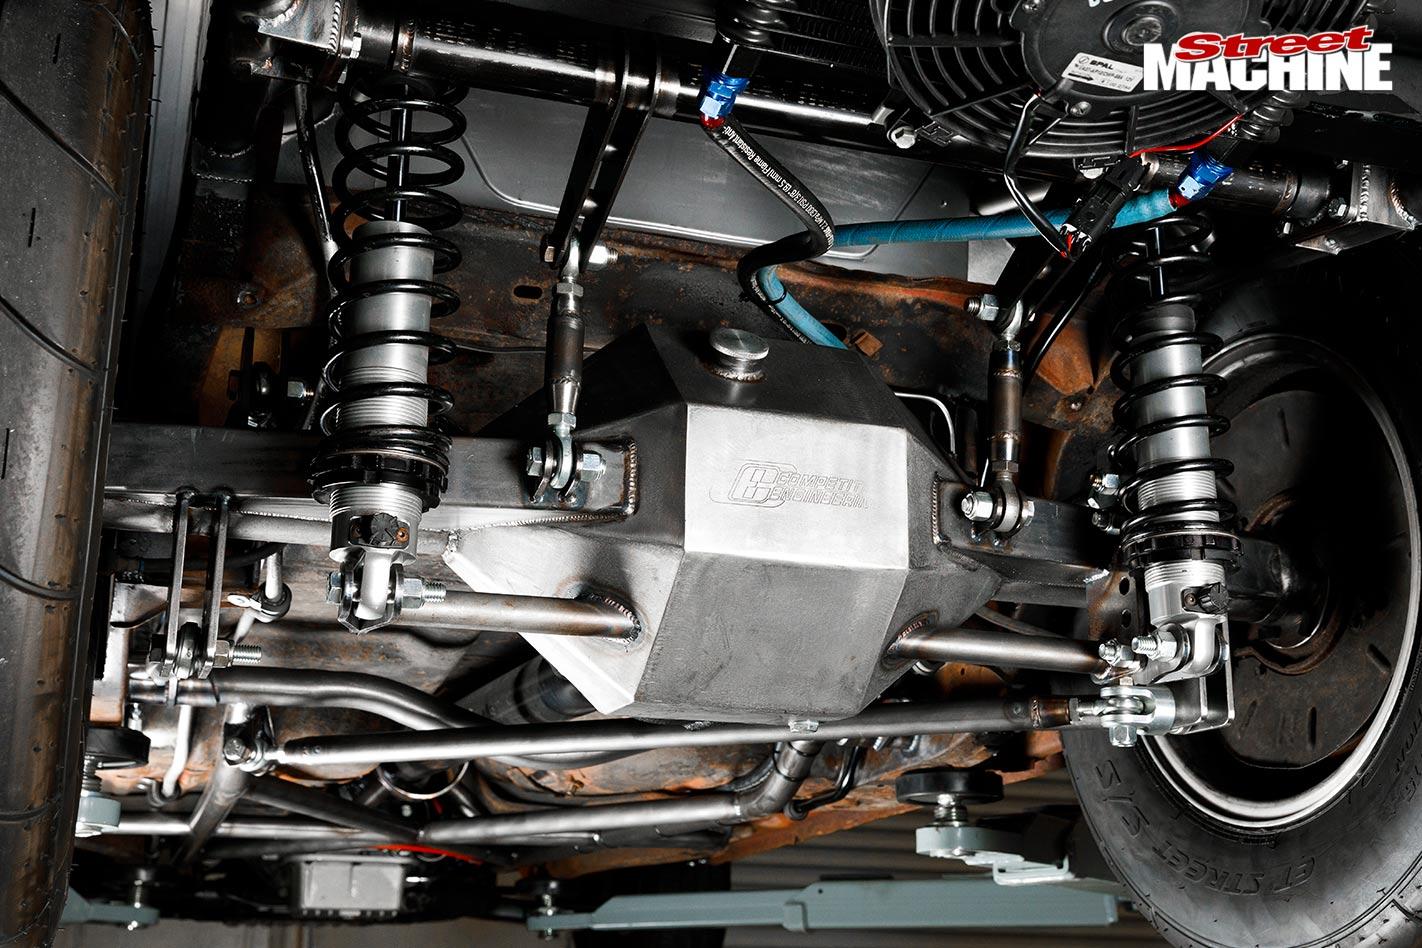 Ford Capri under